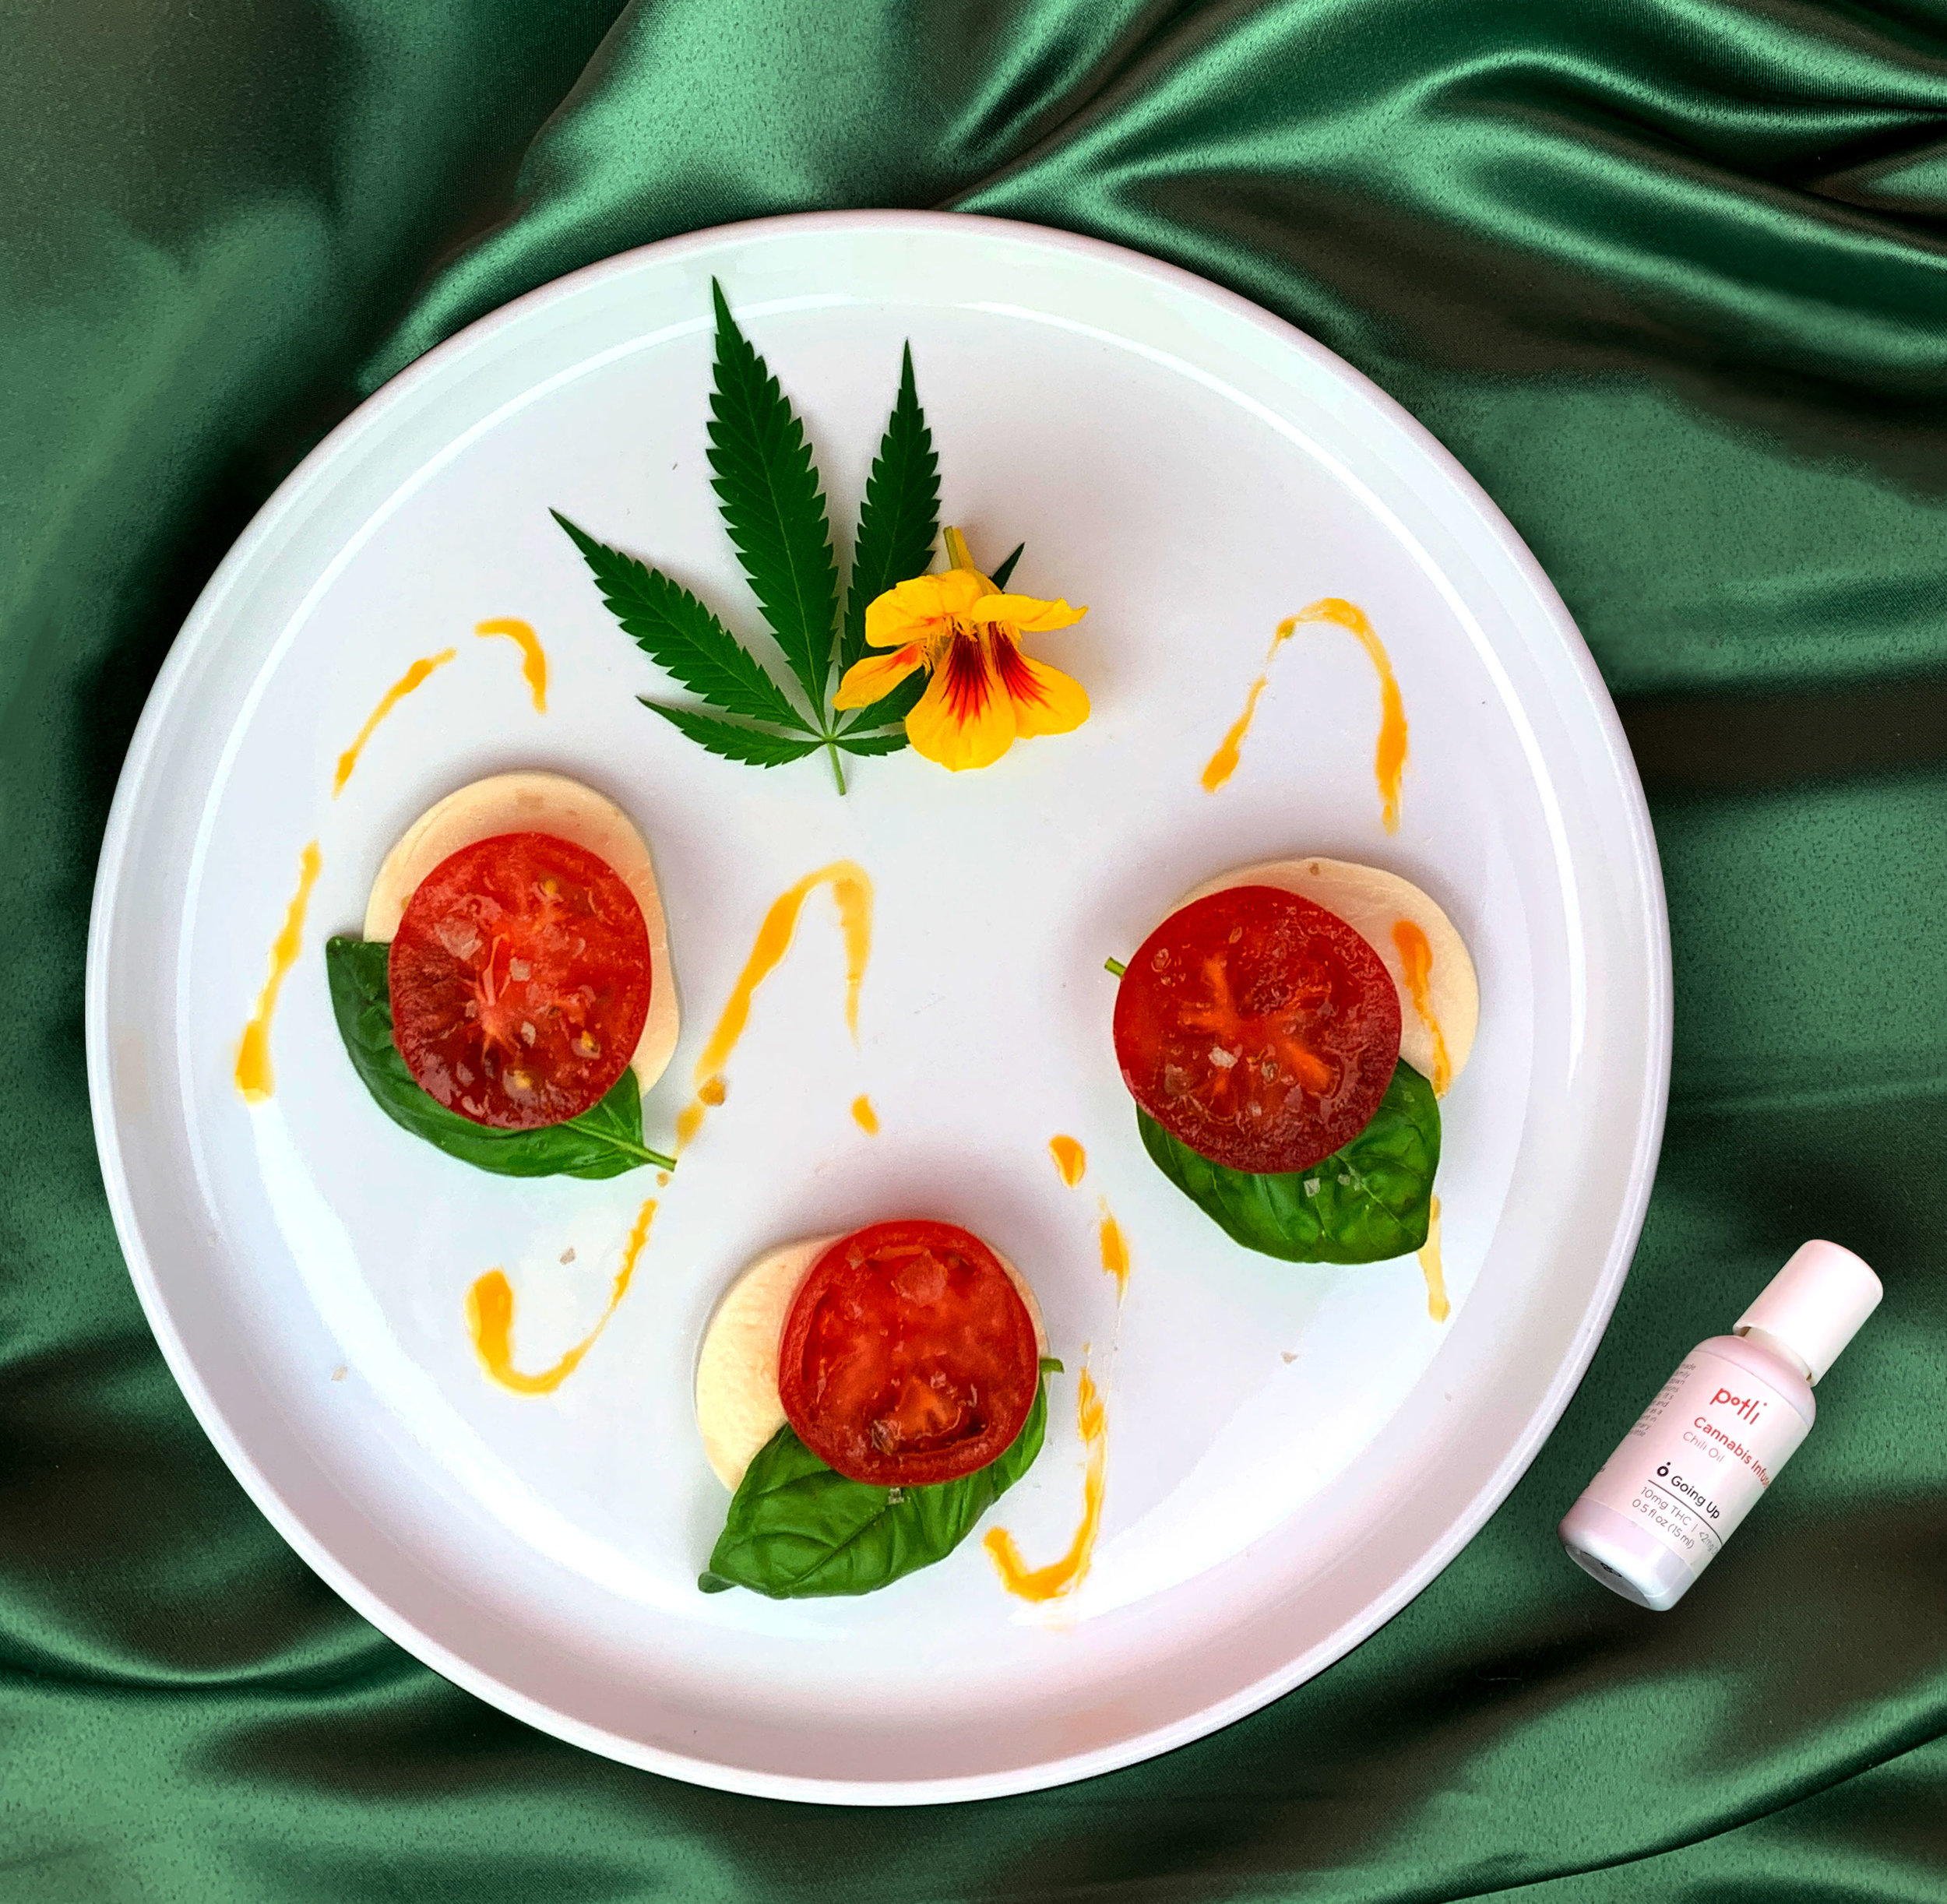 Potli cannabis-infused chili oil Caprese salad.